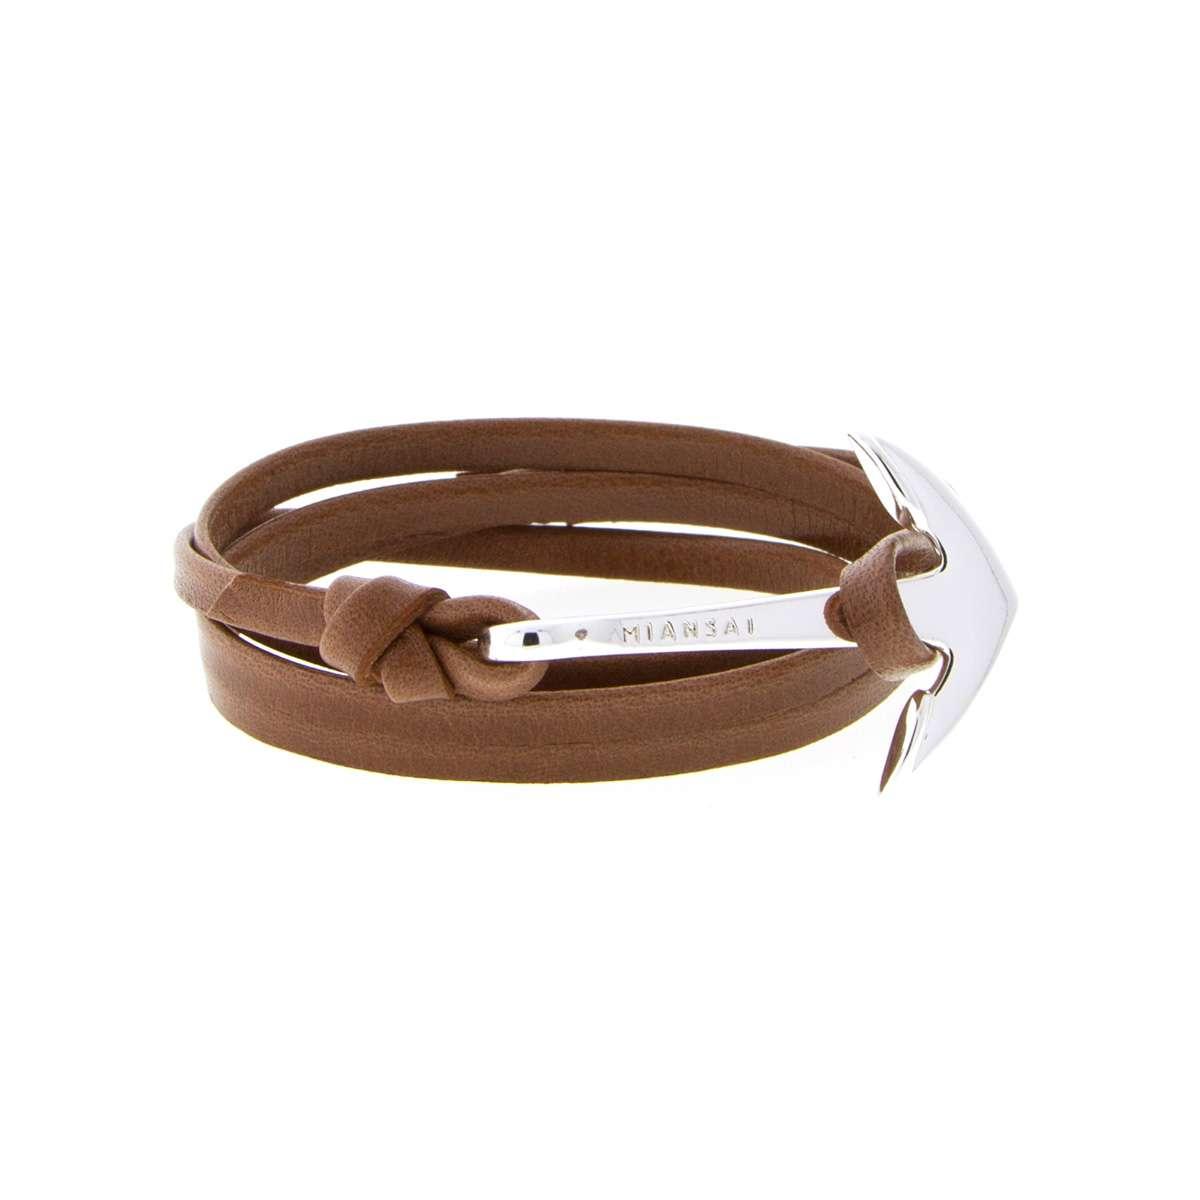 miansai brown leather silver anchor bracelt